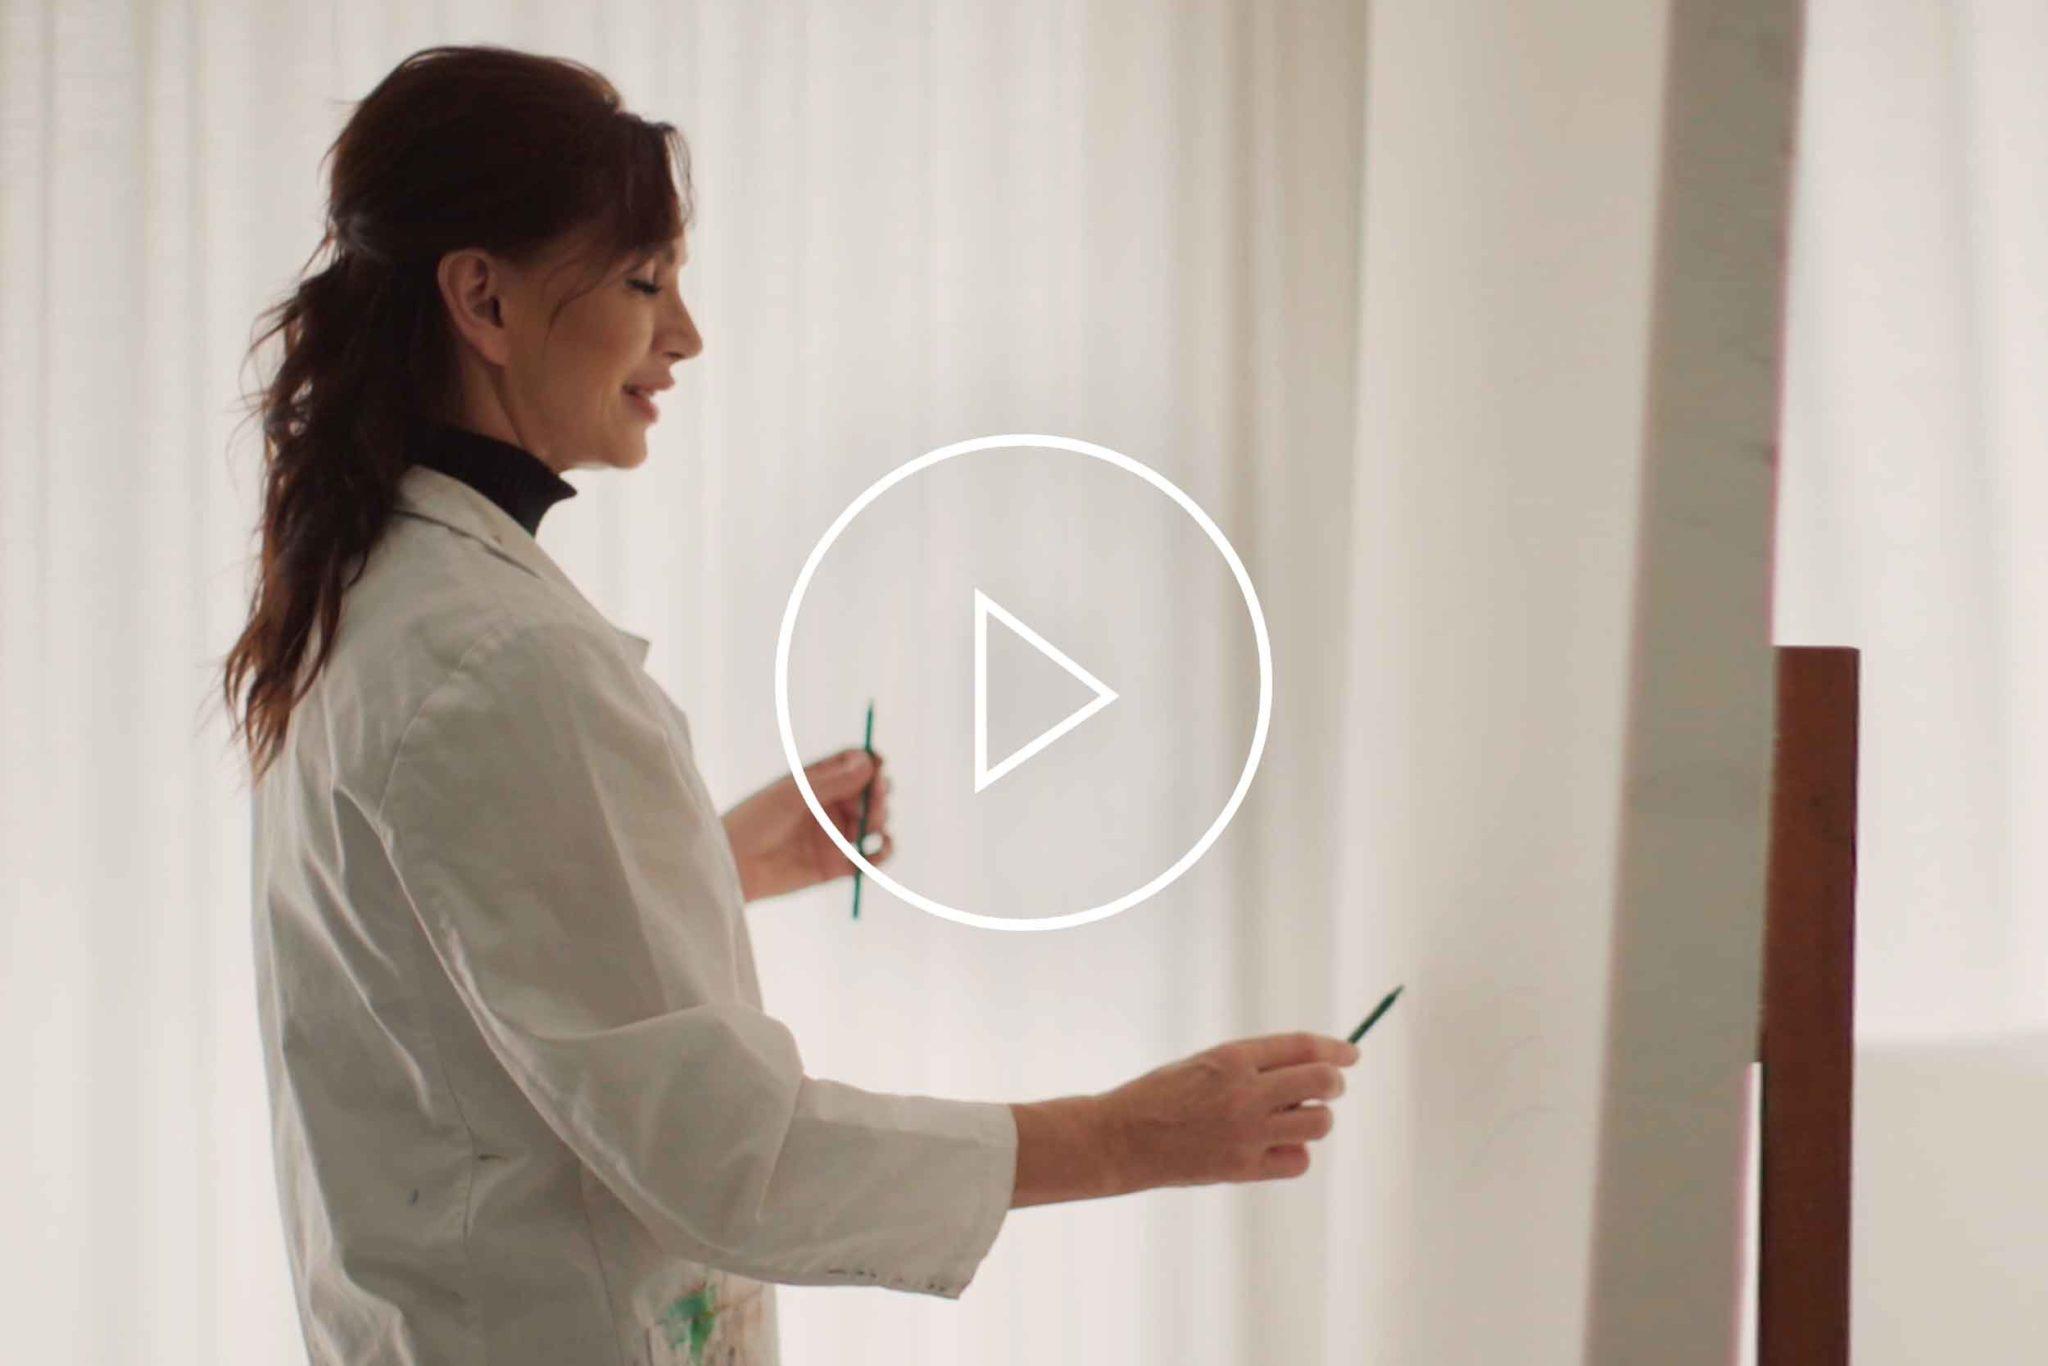 La Galleria Cornelia Hagmann Silk Scarves Story Movie 2020 Cornelia Painting, Seidenschal, sciarpa di seta, foulard soie,